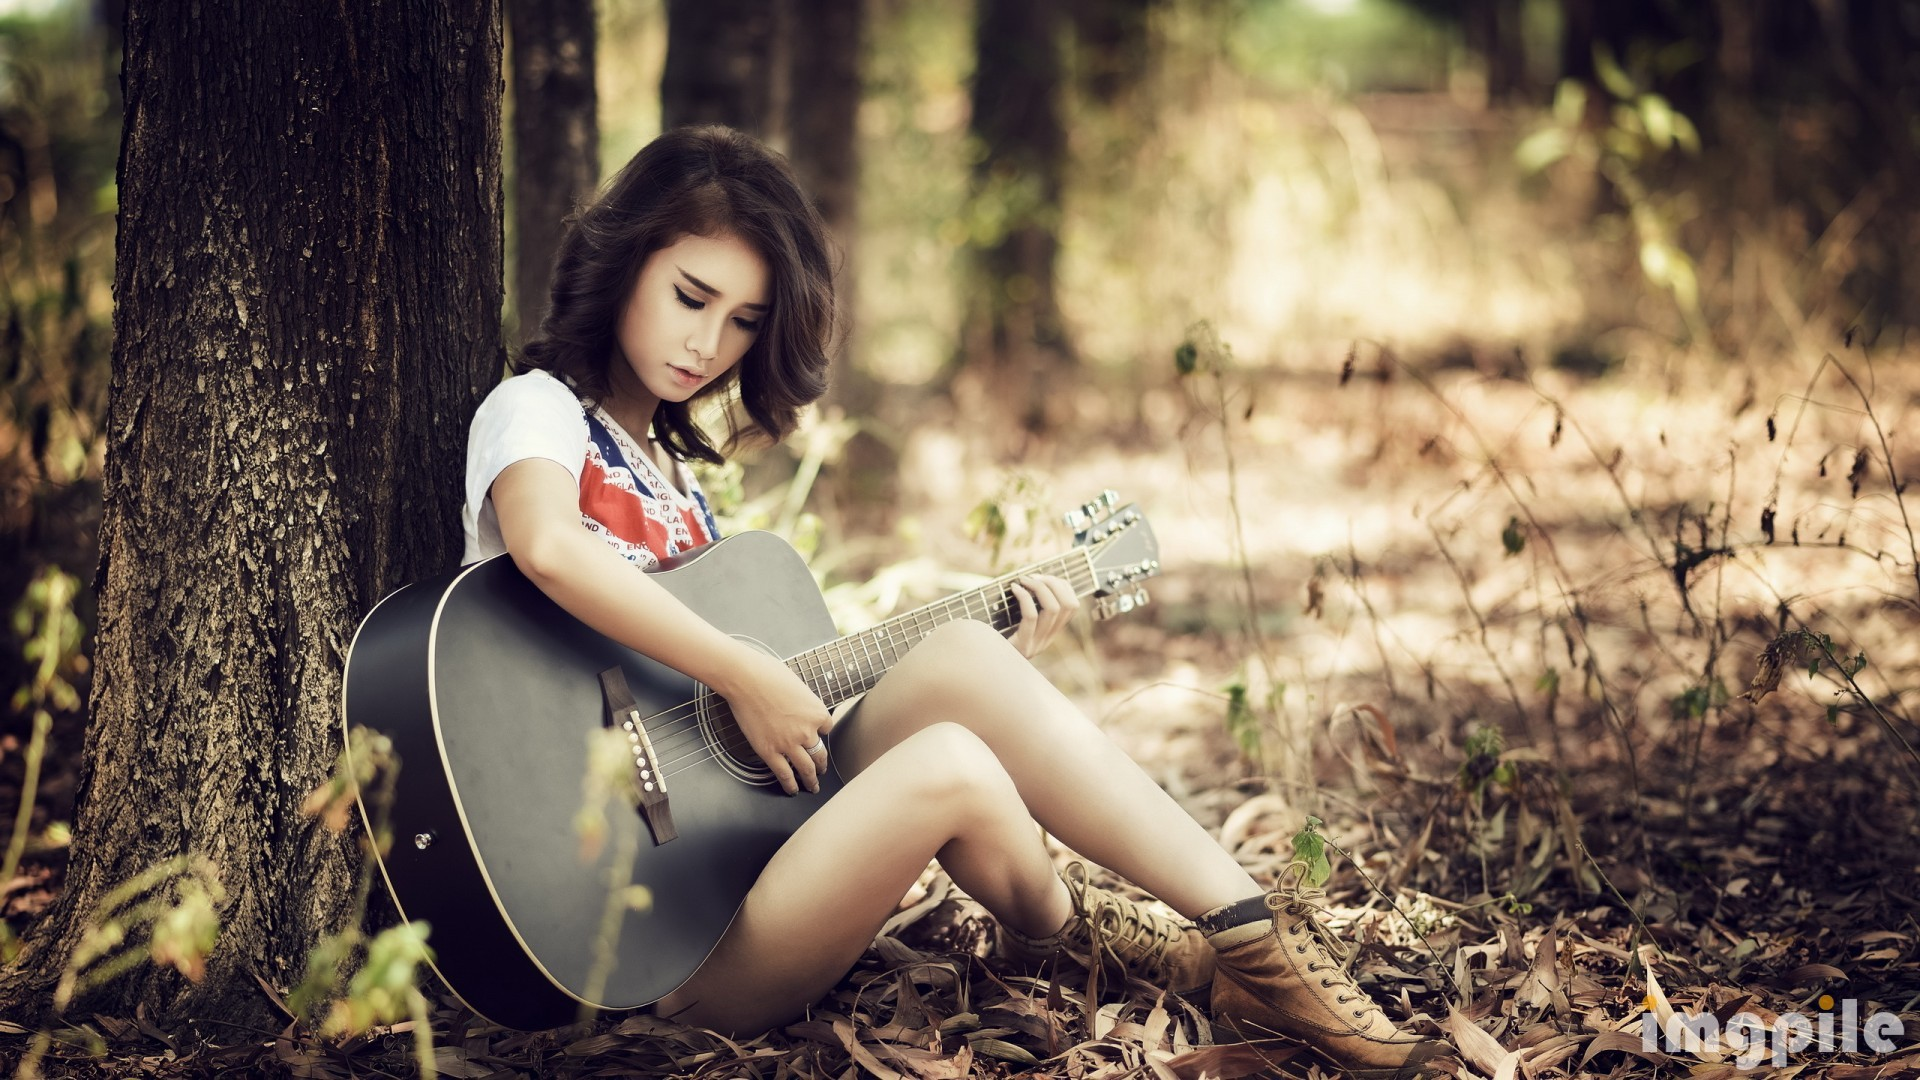 beautyful girl models - photo #15